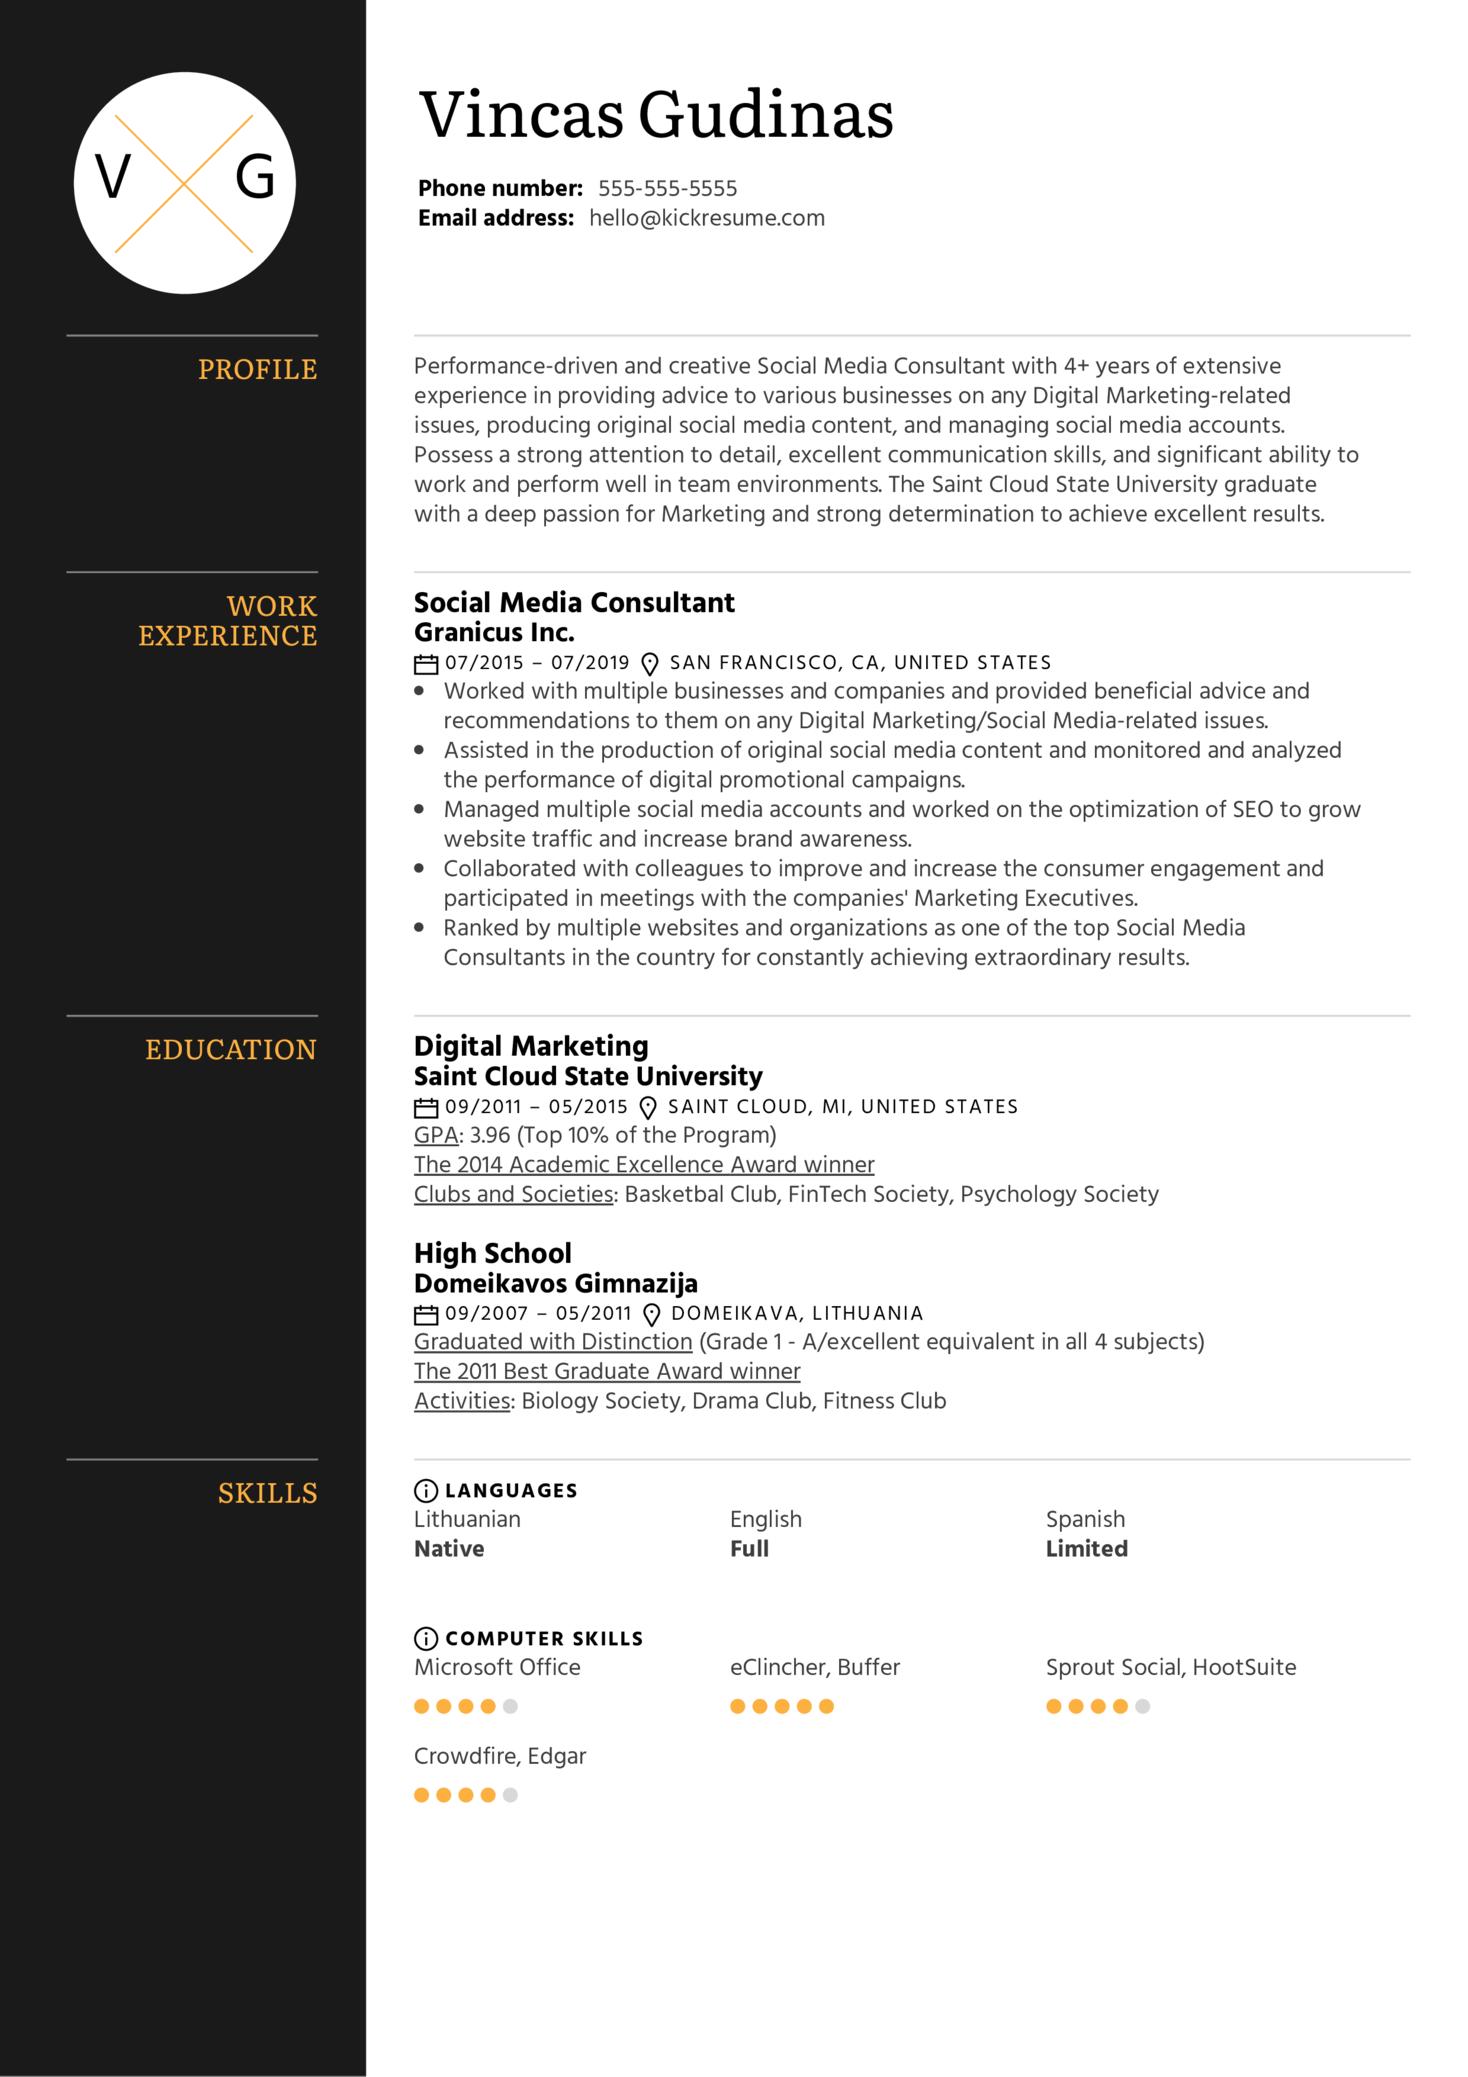 Social Media Consultant Resume Example (Part 1)